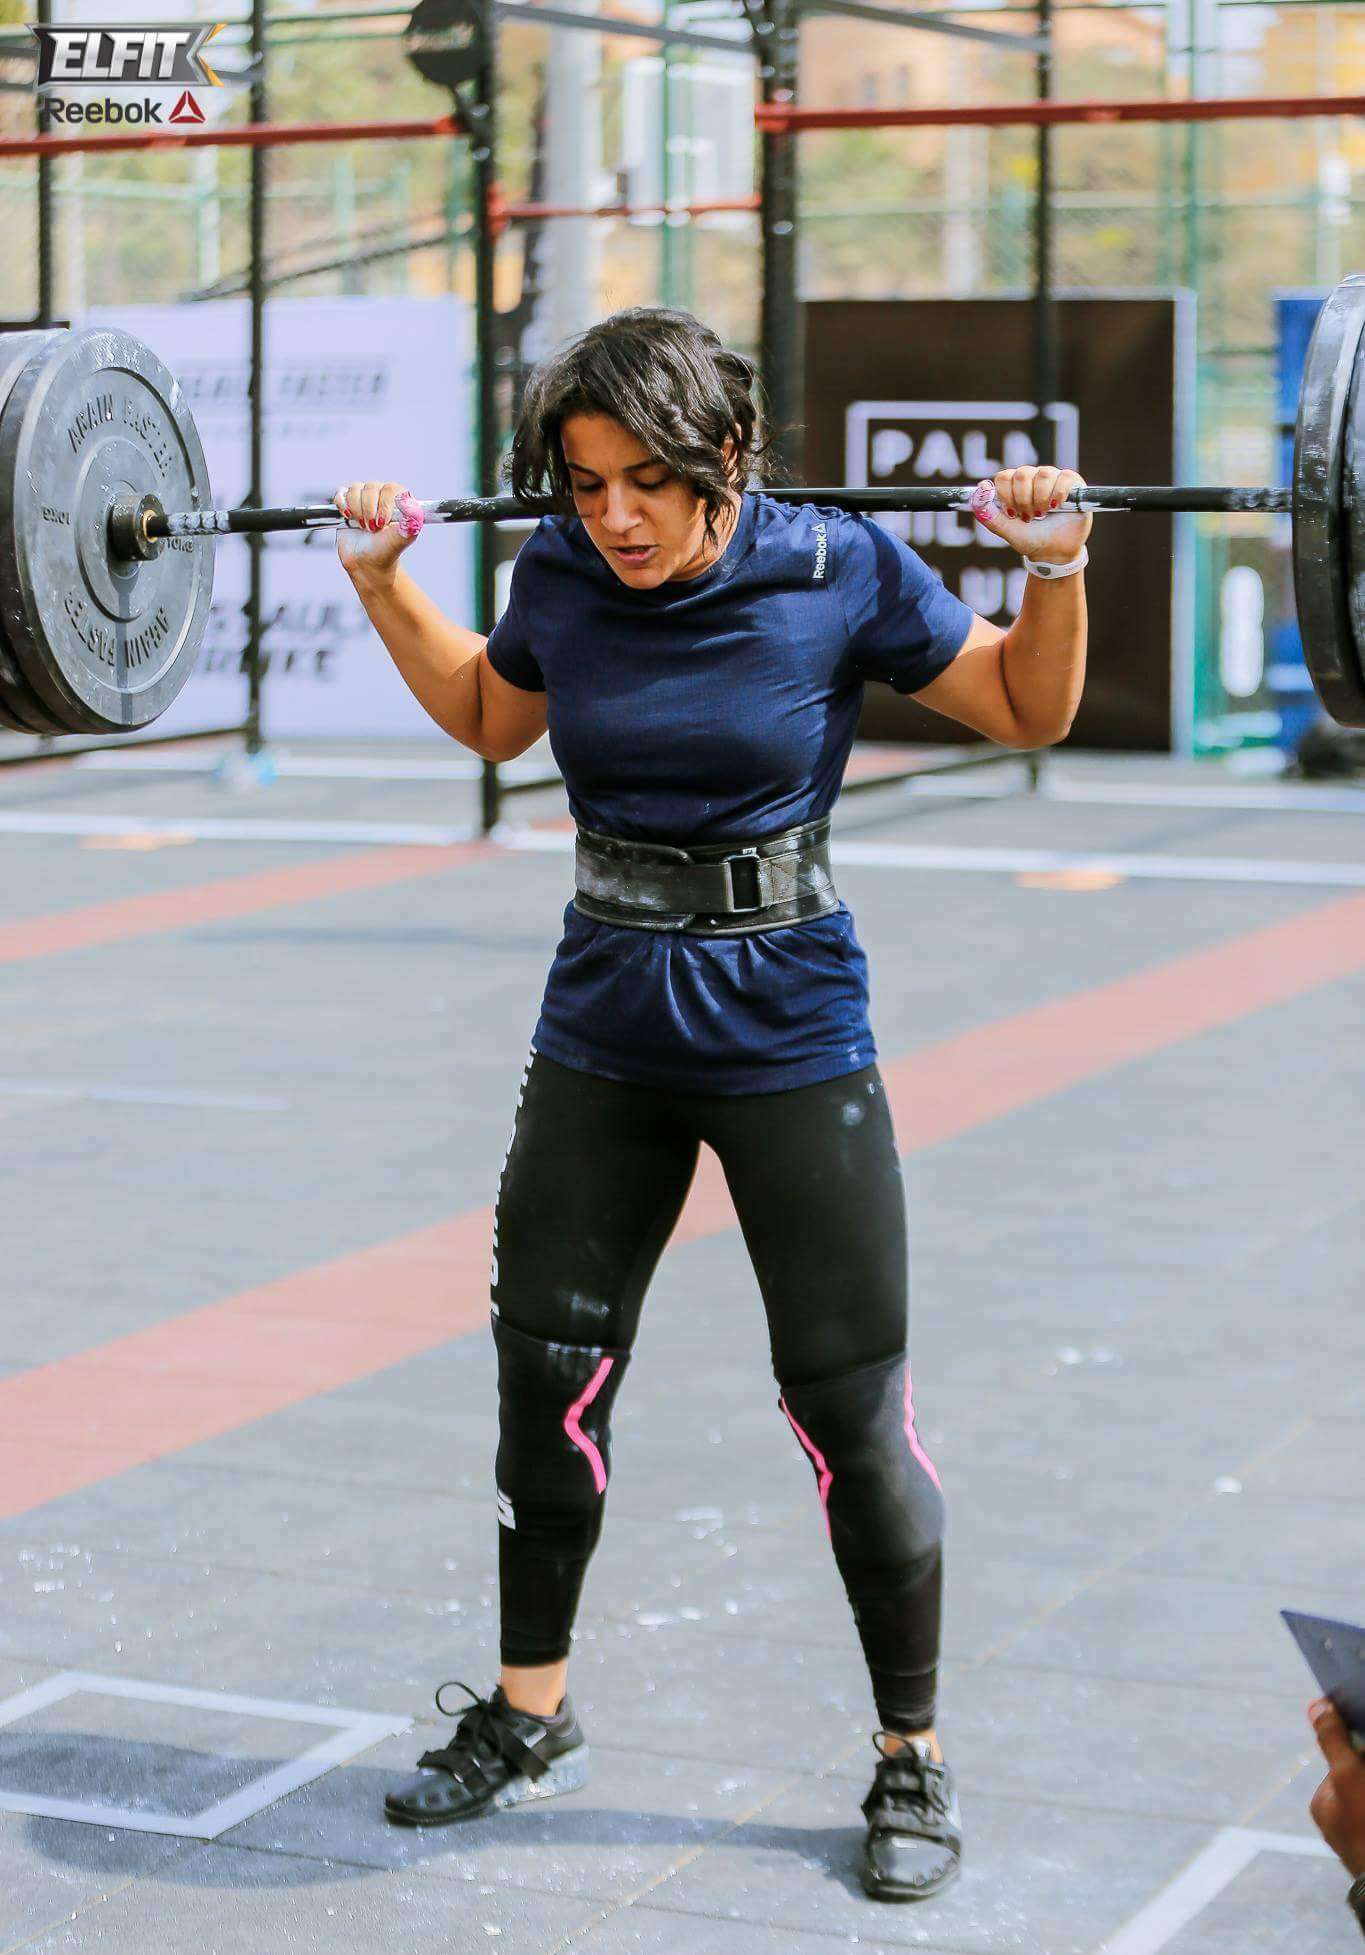 Rana El Deeb